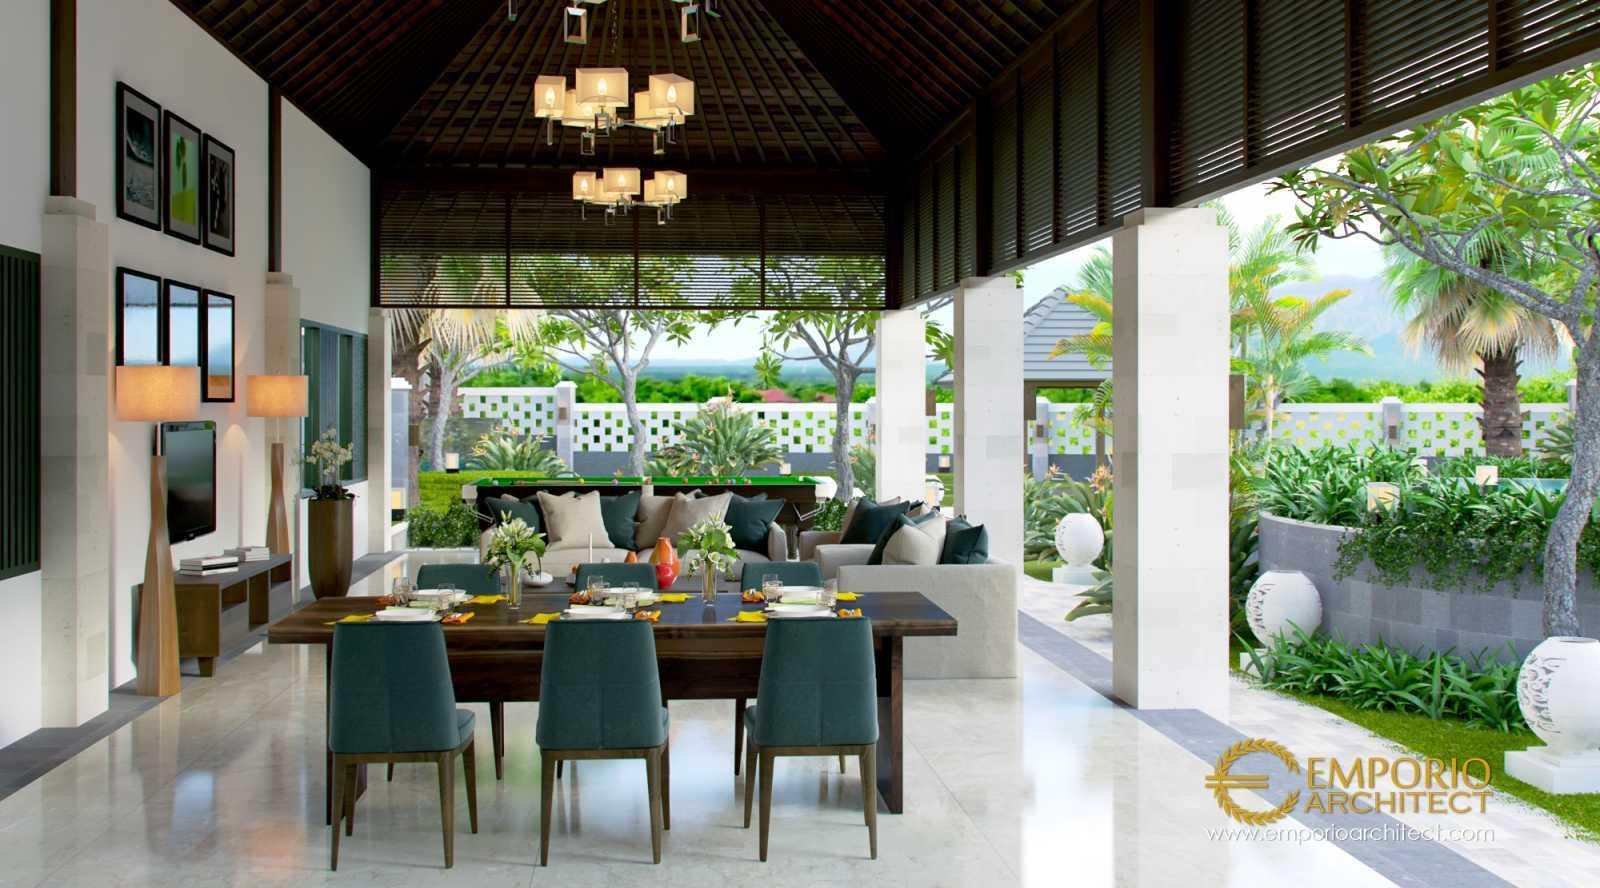 Emporio Architect Desain Bungalow Villa Bali Tropis 444 @ Karangasem, Bali Kabupaten Karangasem, Bali, Indonesia Kabupaten Karangasem, Bali, Indonesia Emporio-Architect-Desain-Bungalow-Villa-Bali-Tropis-444-Karangasem-Bali   77769